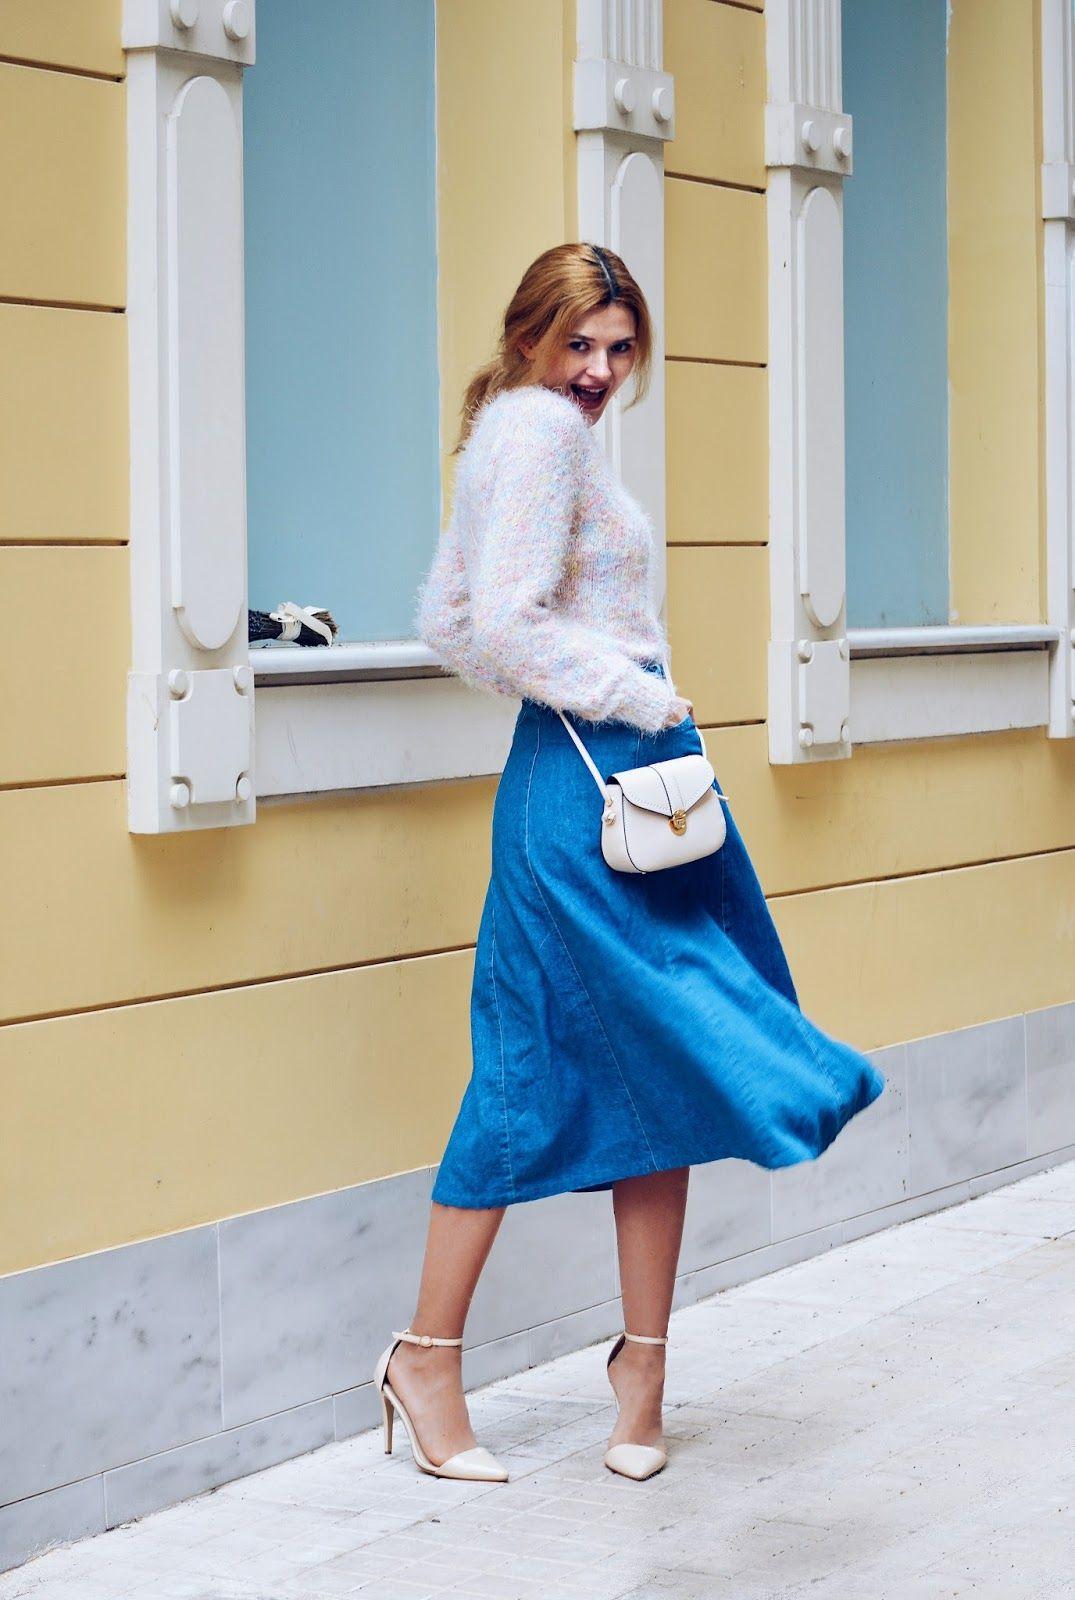 HEY GIRL - M&M Fashion Bites #fetishpantyhose #pantyhosefetish #legs #heels #blogger #stiletto #pantyhose #collant #tan